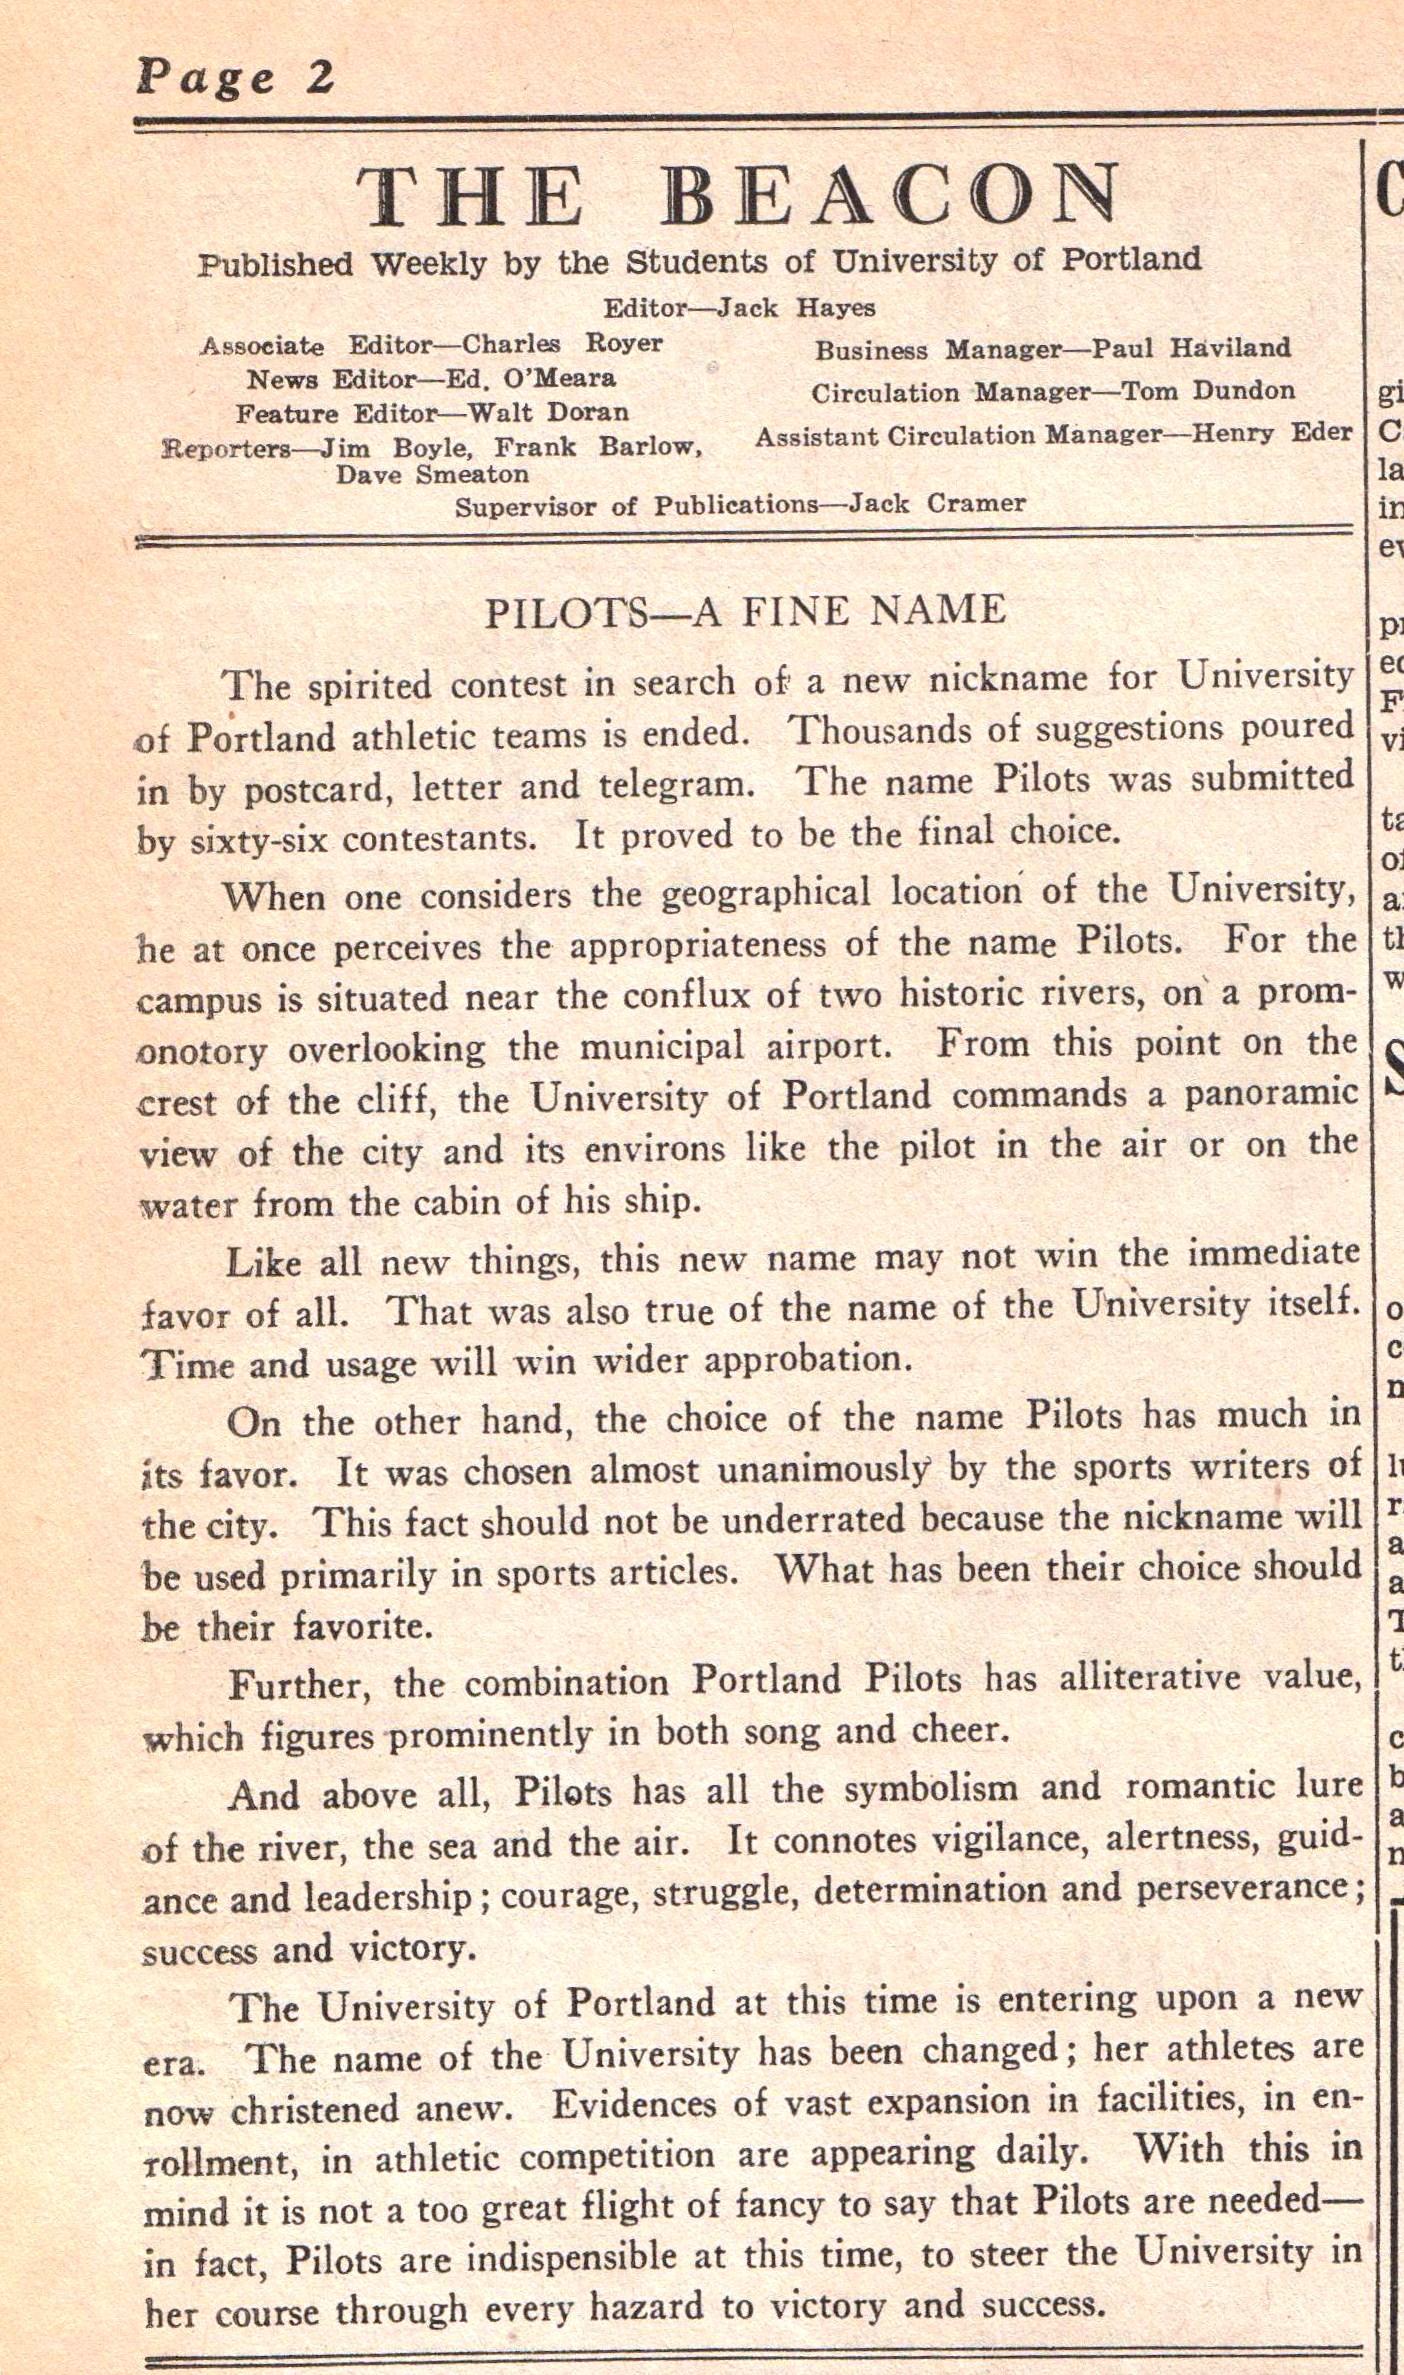 The Beacon, April 12, 1935